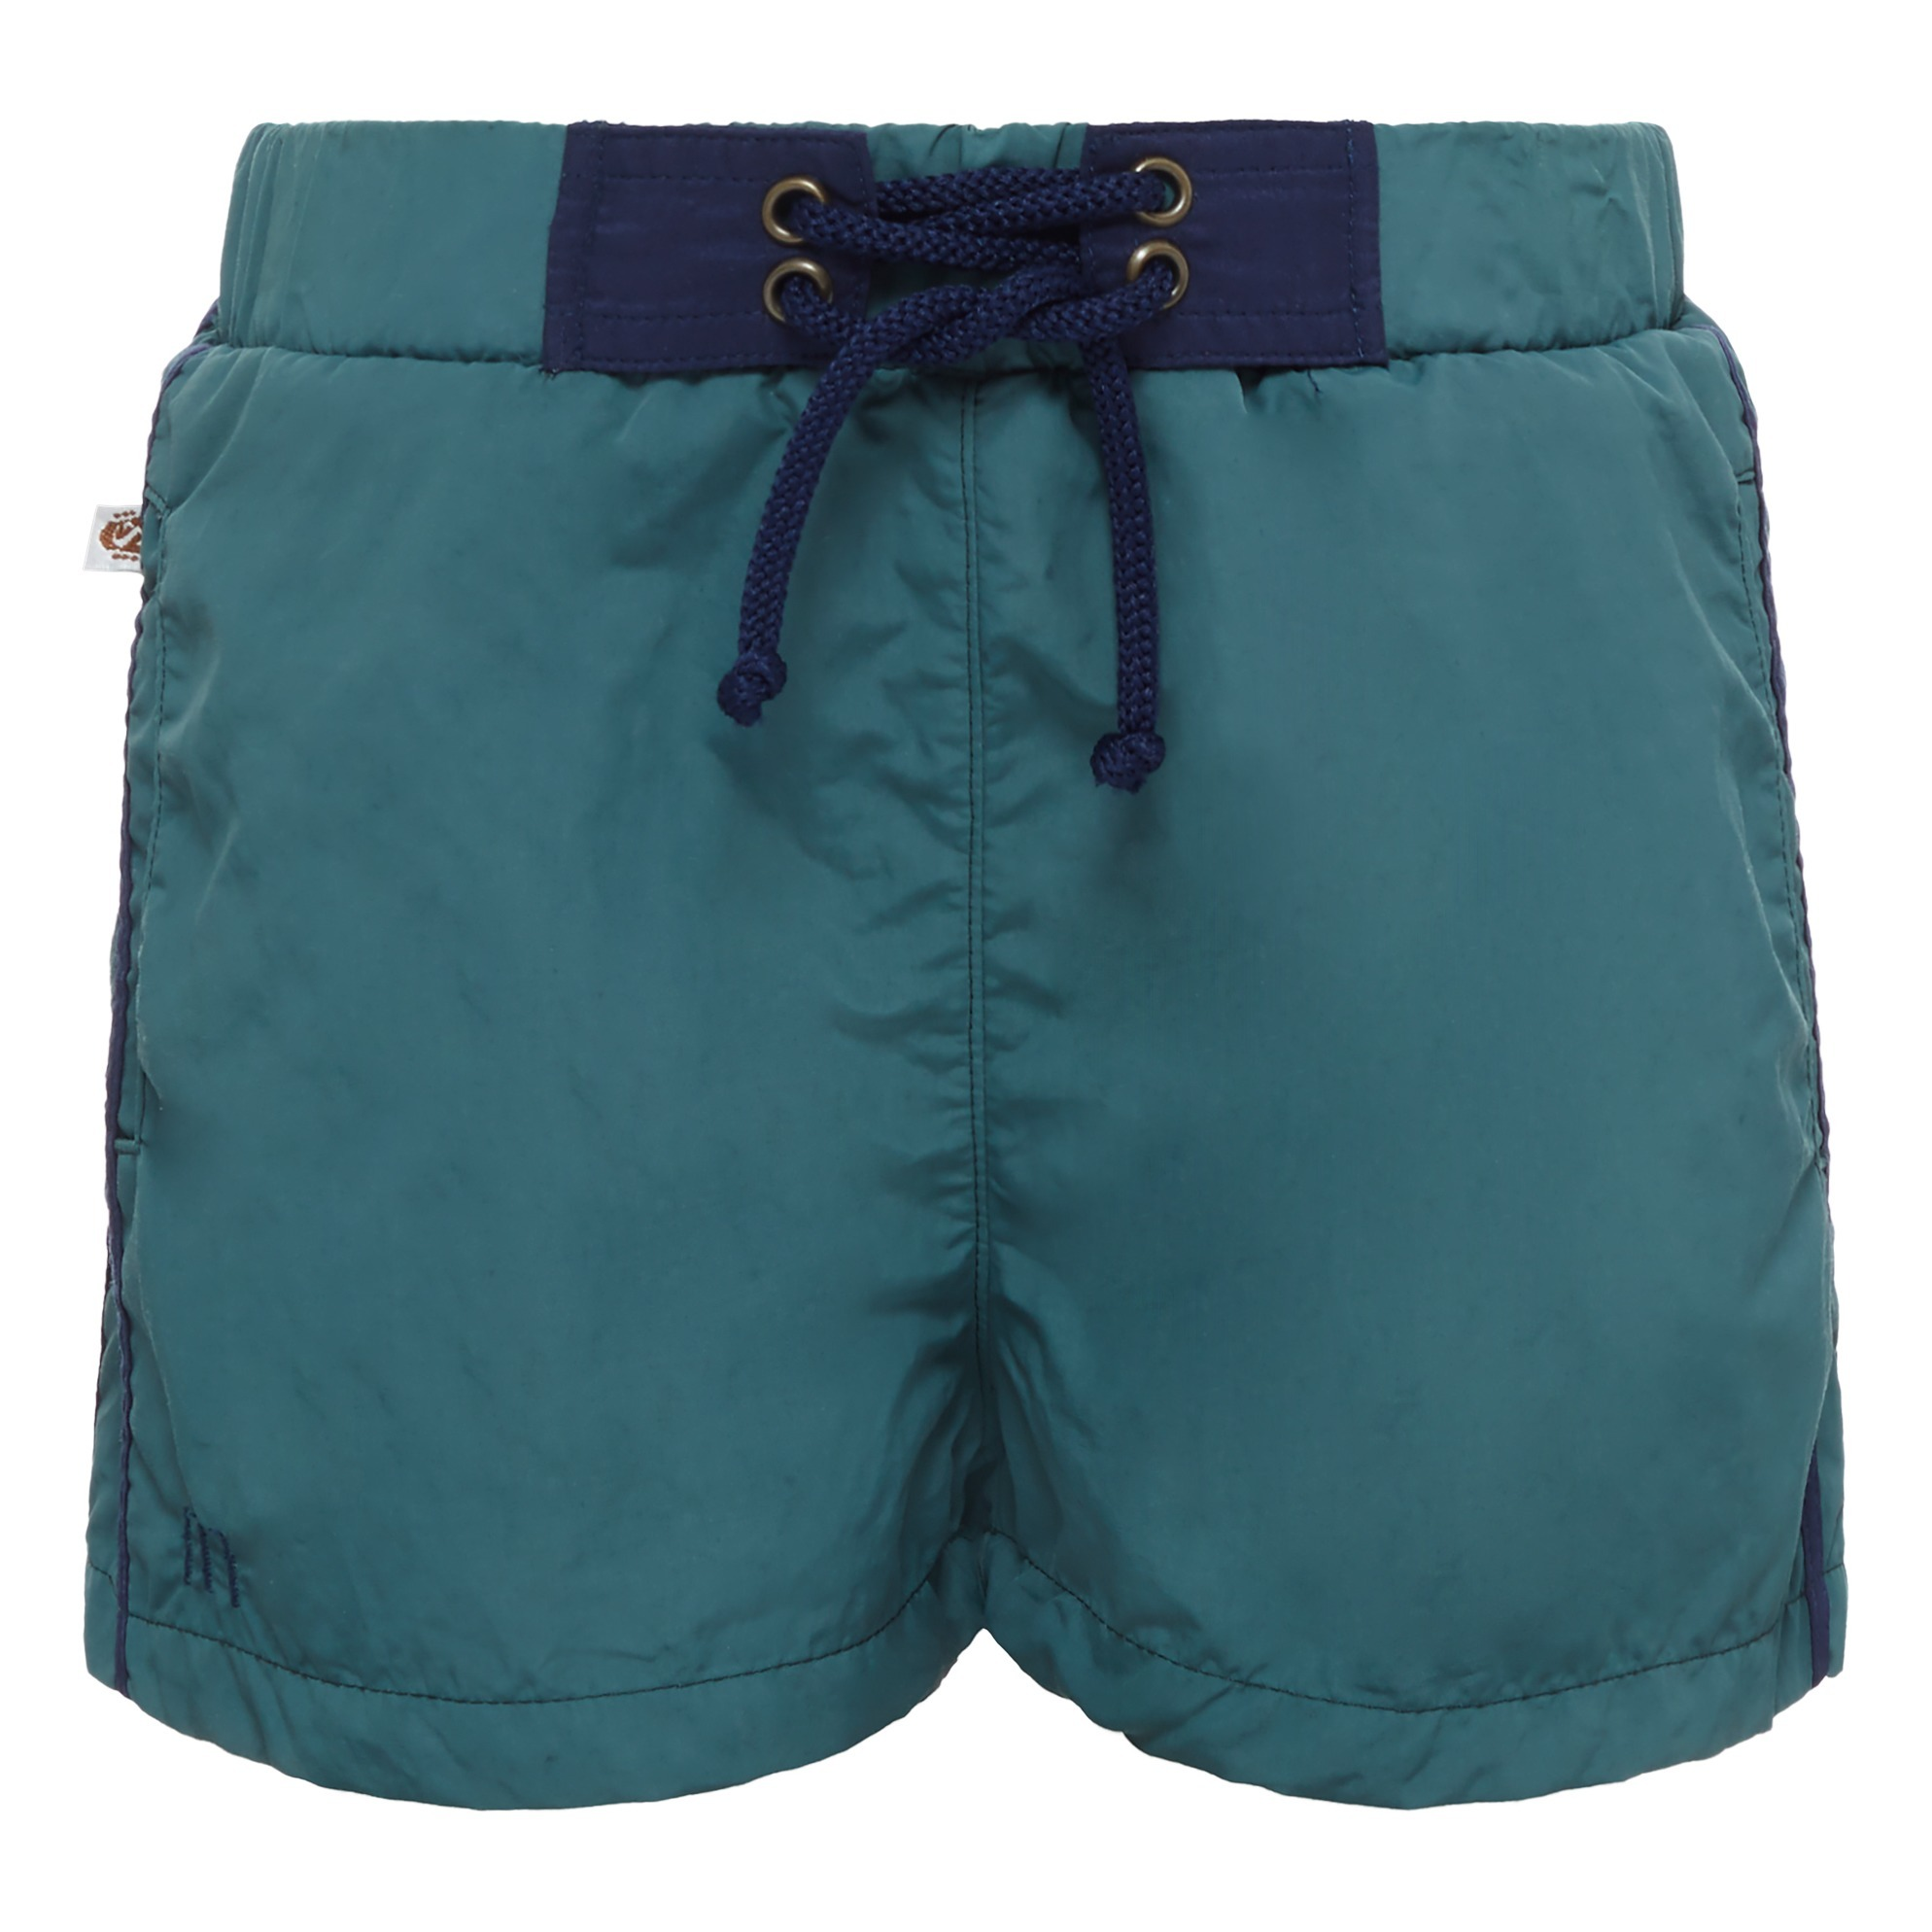 Sunchild - Short de Bain Tonga Sunchild x Smallable - Garçon - Vert kaki